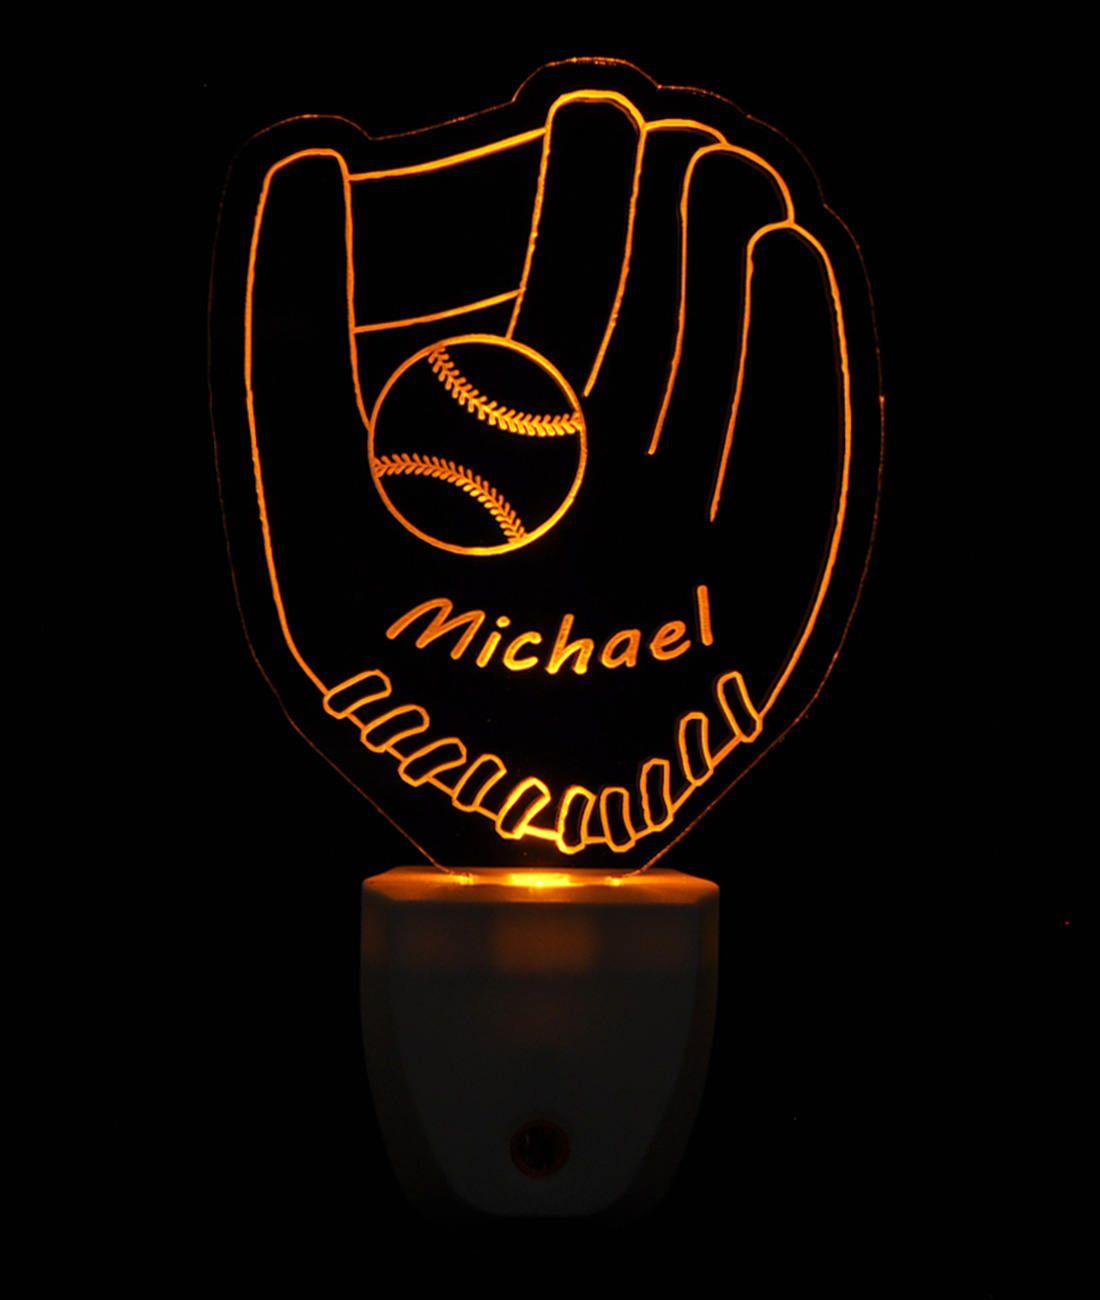 Baseball And Baseball Glove Light Sensor LED Plug In Night Light, Personalized Custom LED Nightlight by NeedForLight on Etsy